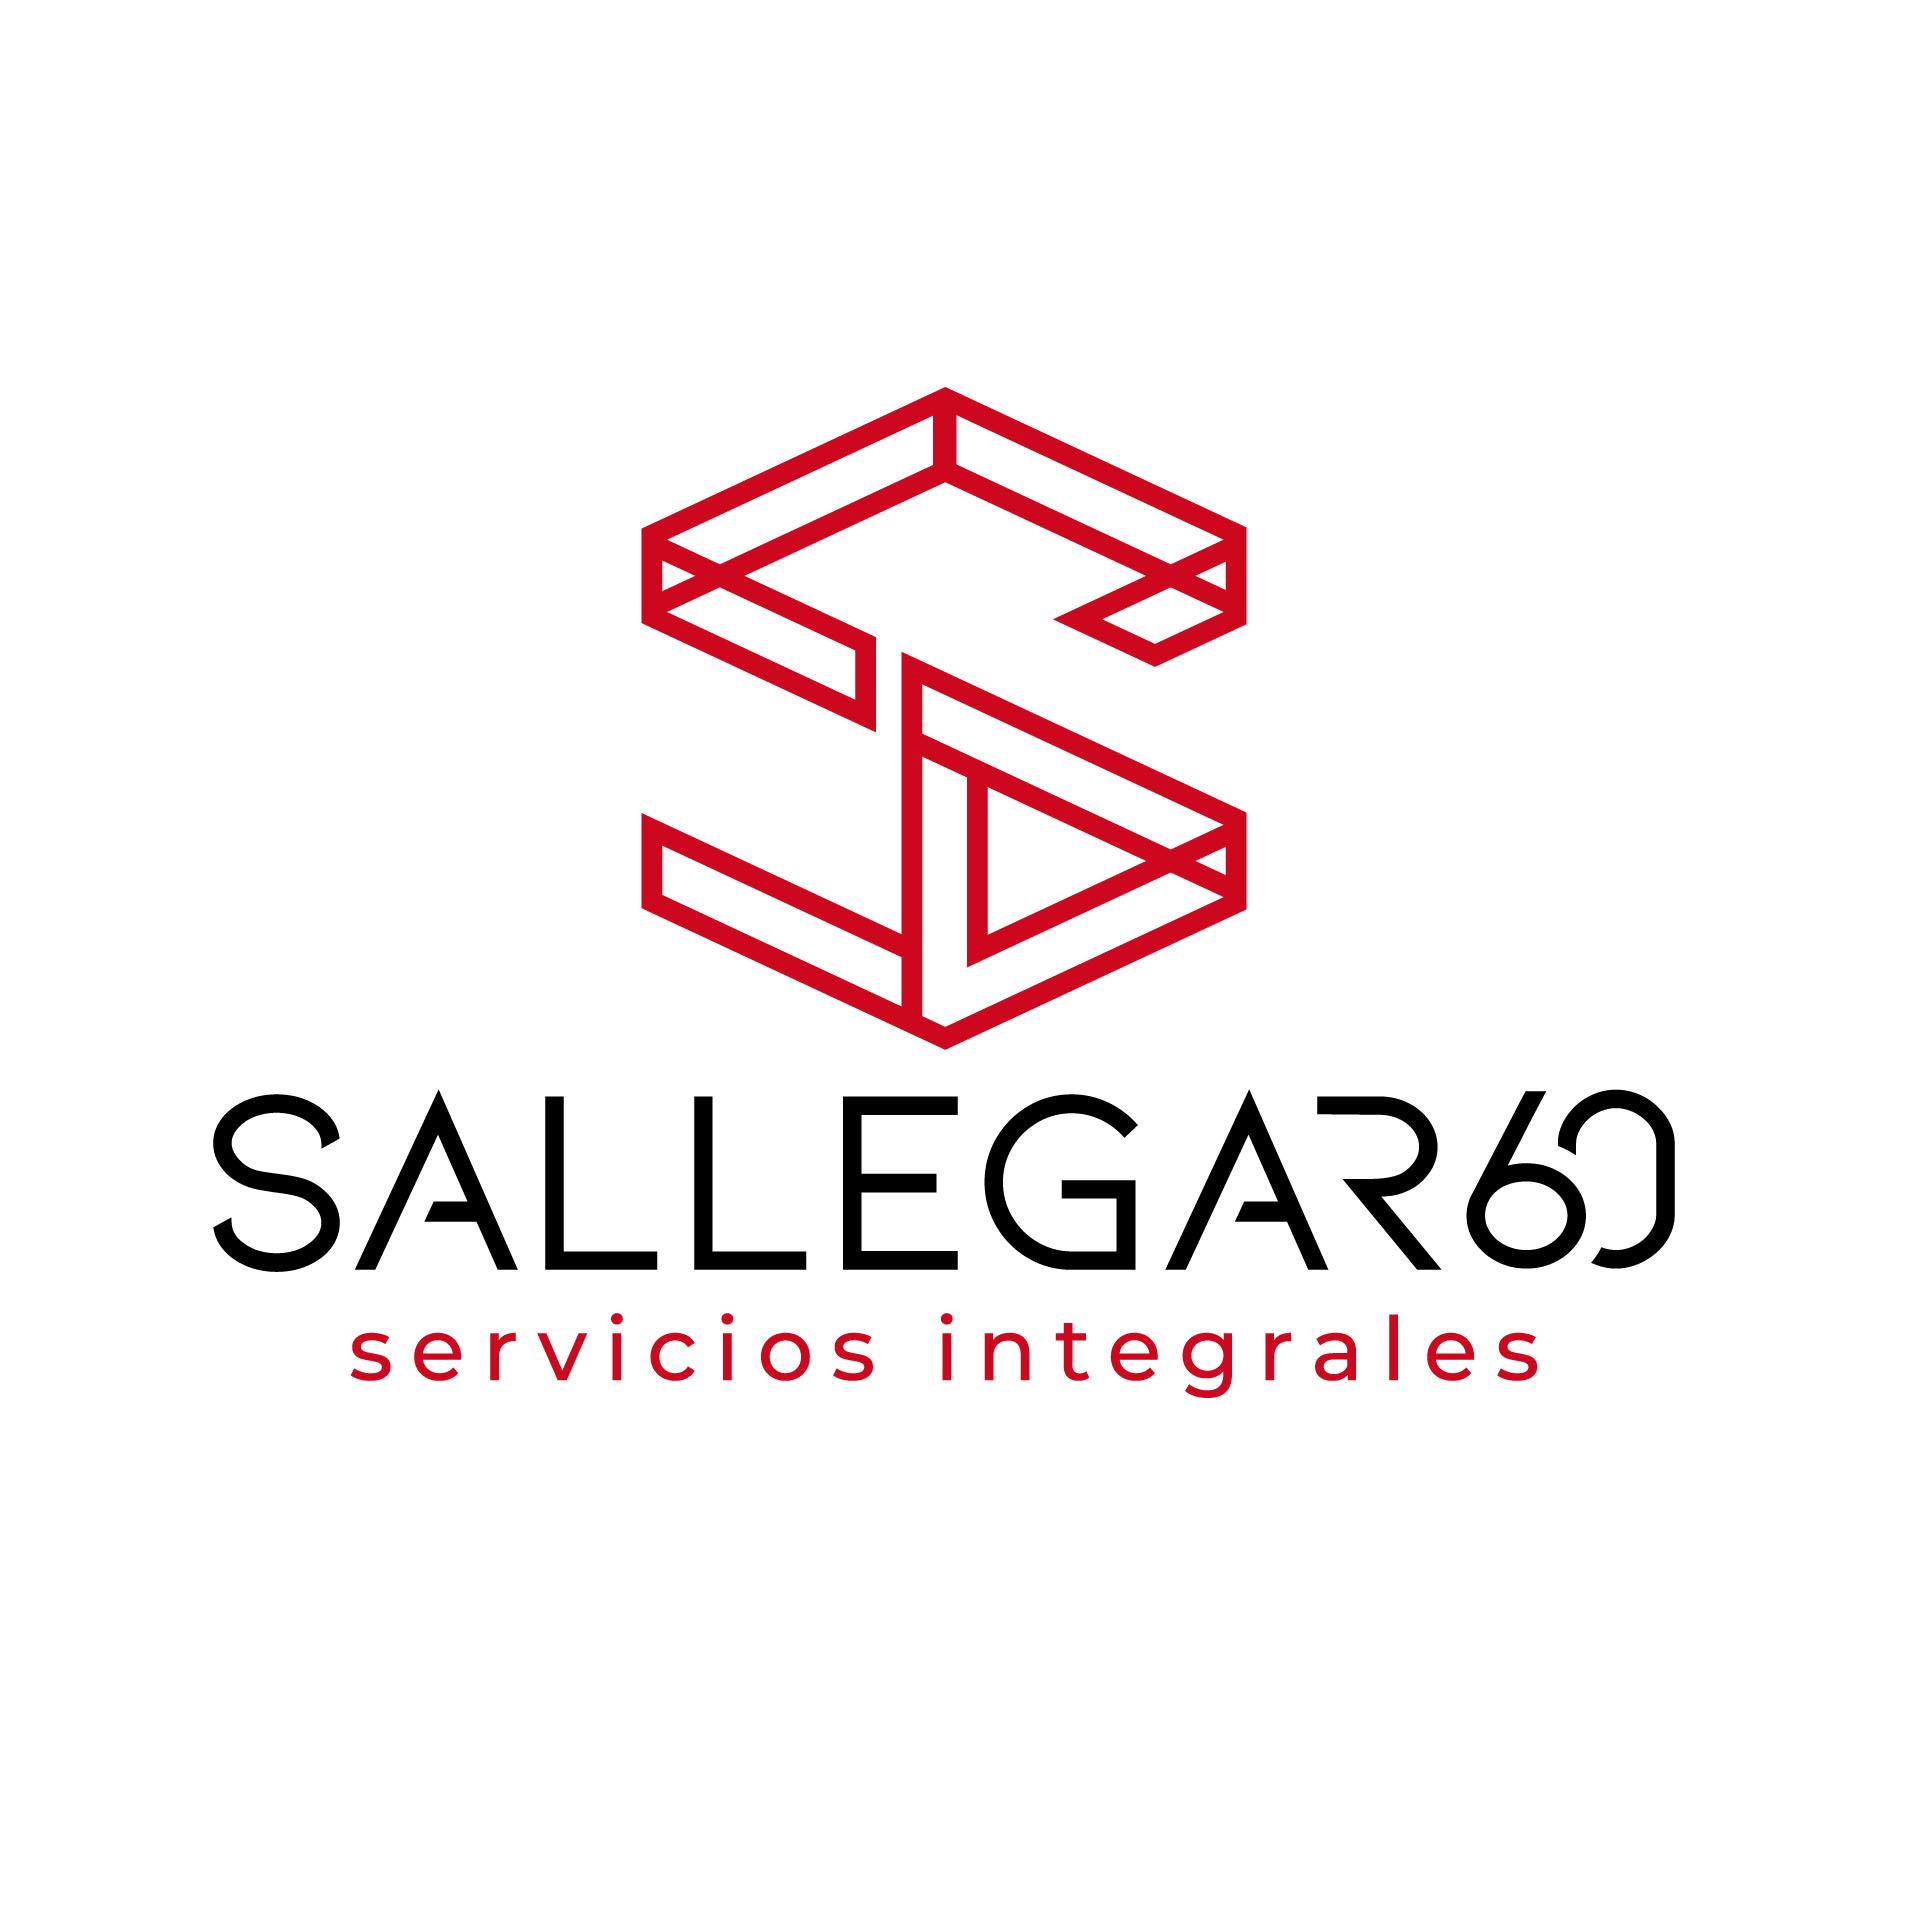 SALLEGAR 60